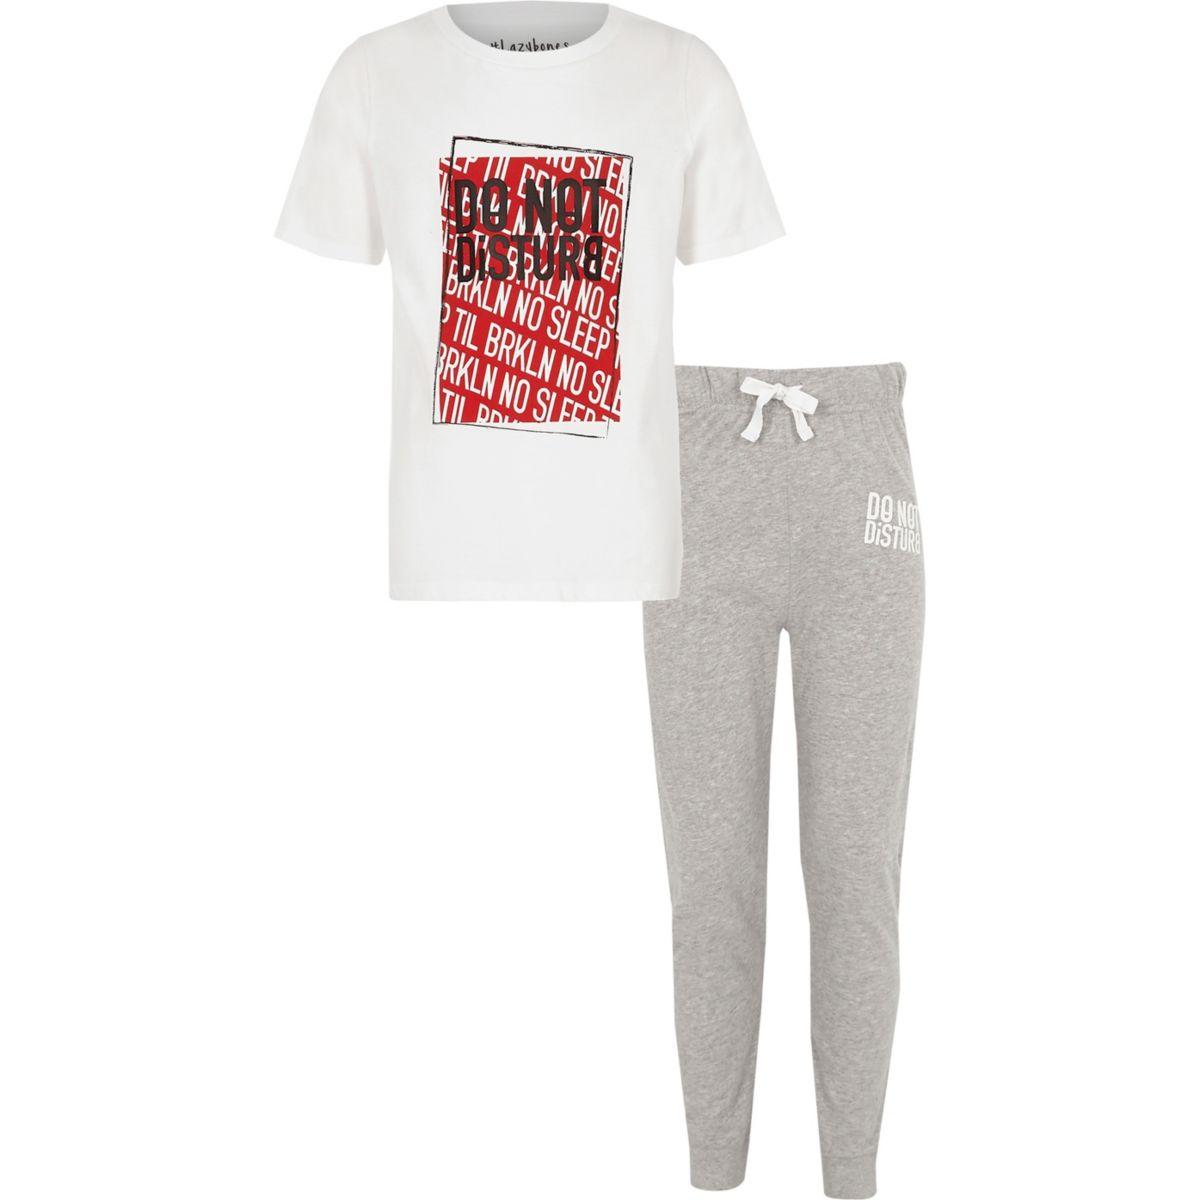 Boys white 'do not disturb' pyjama set